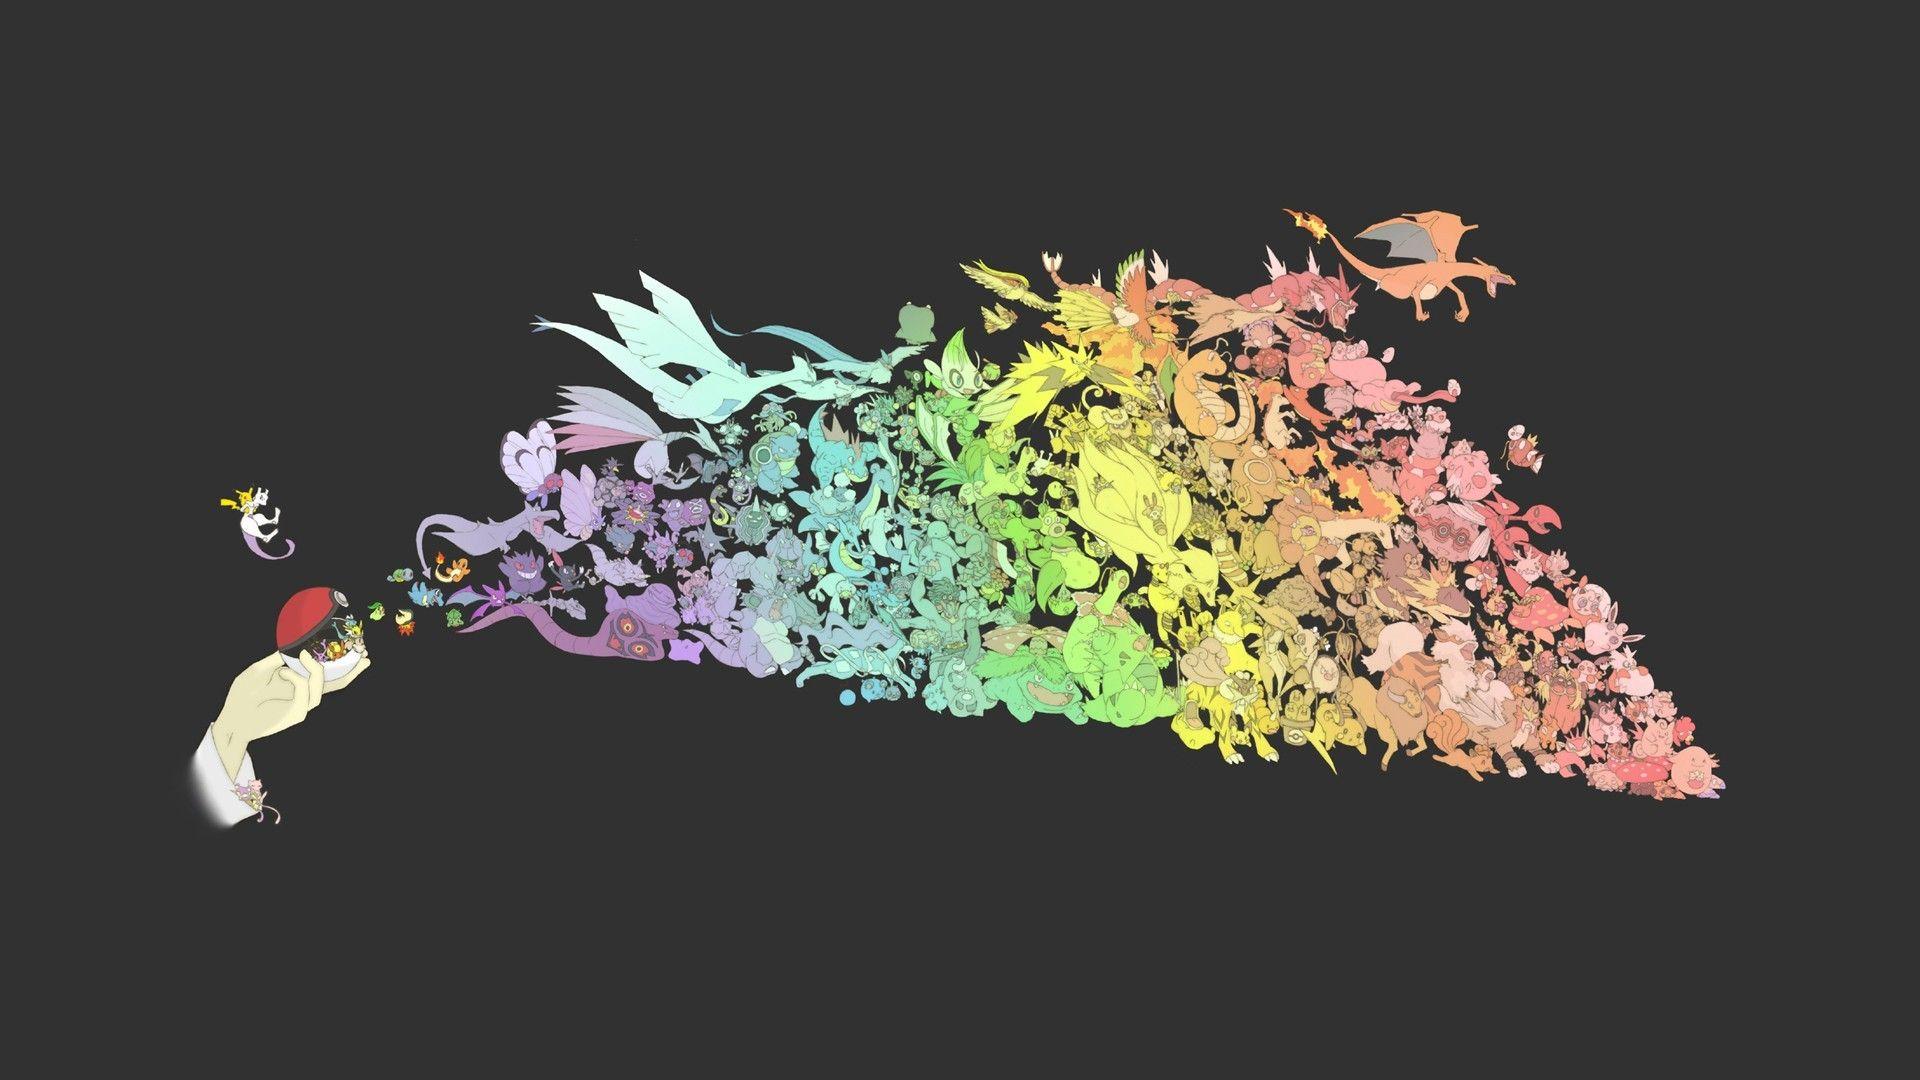 pokemon wallpaper   Large Images Pokemon backgrounds Anime 1920x1080